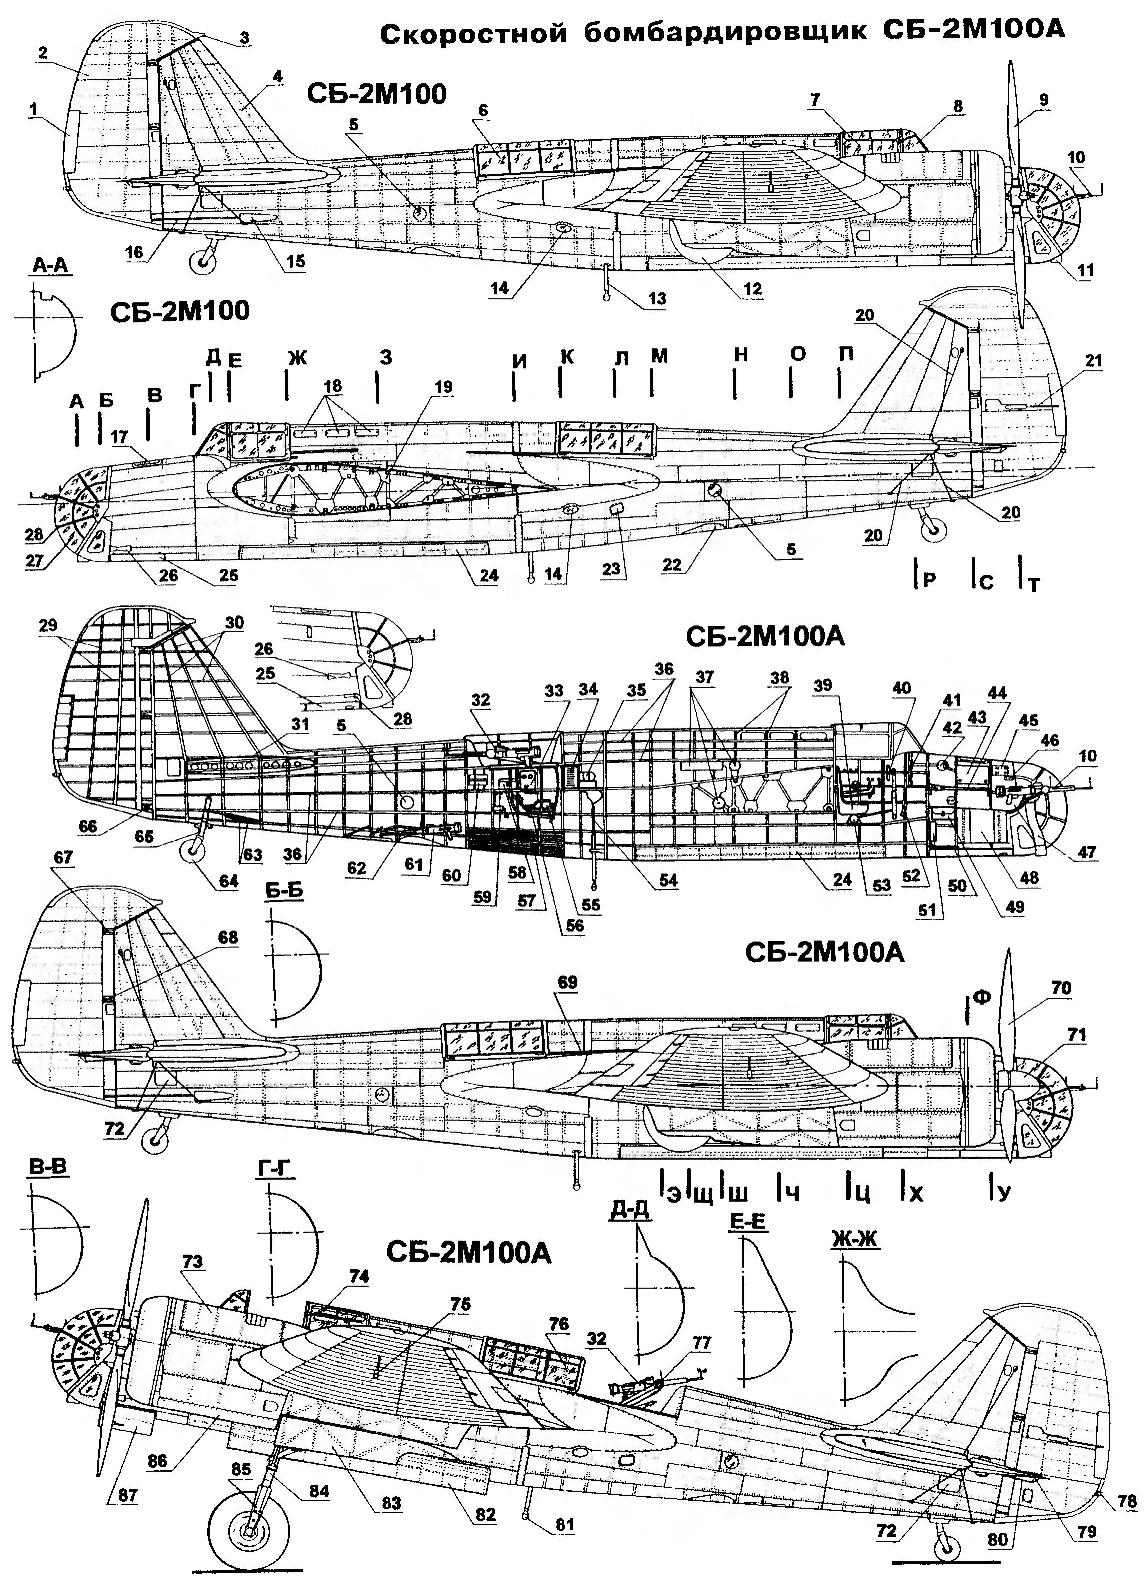 High-speed bomber SB-2